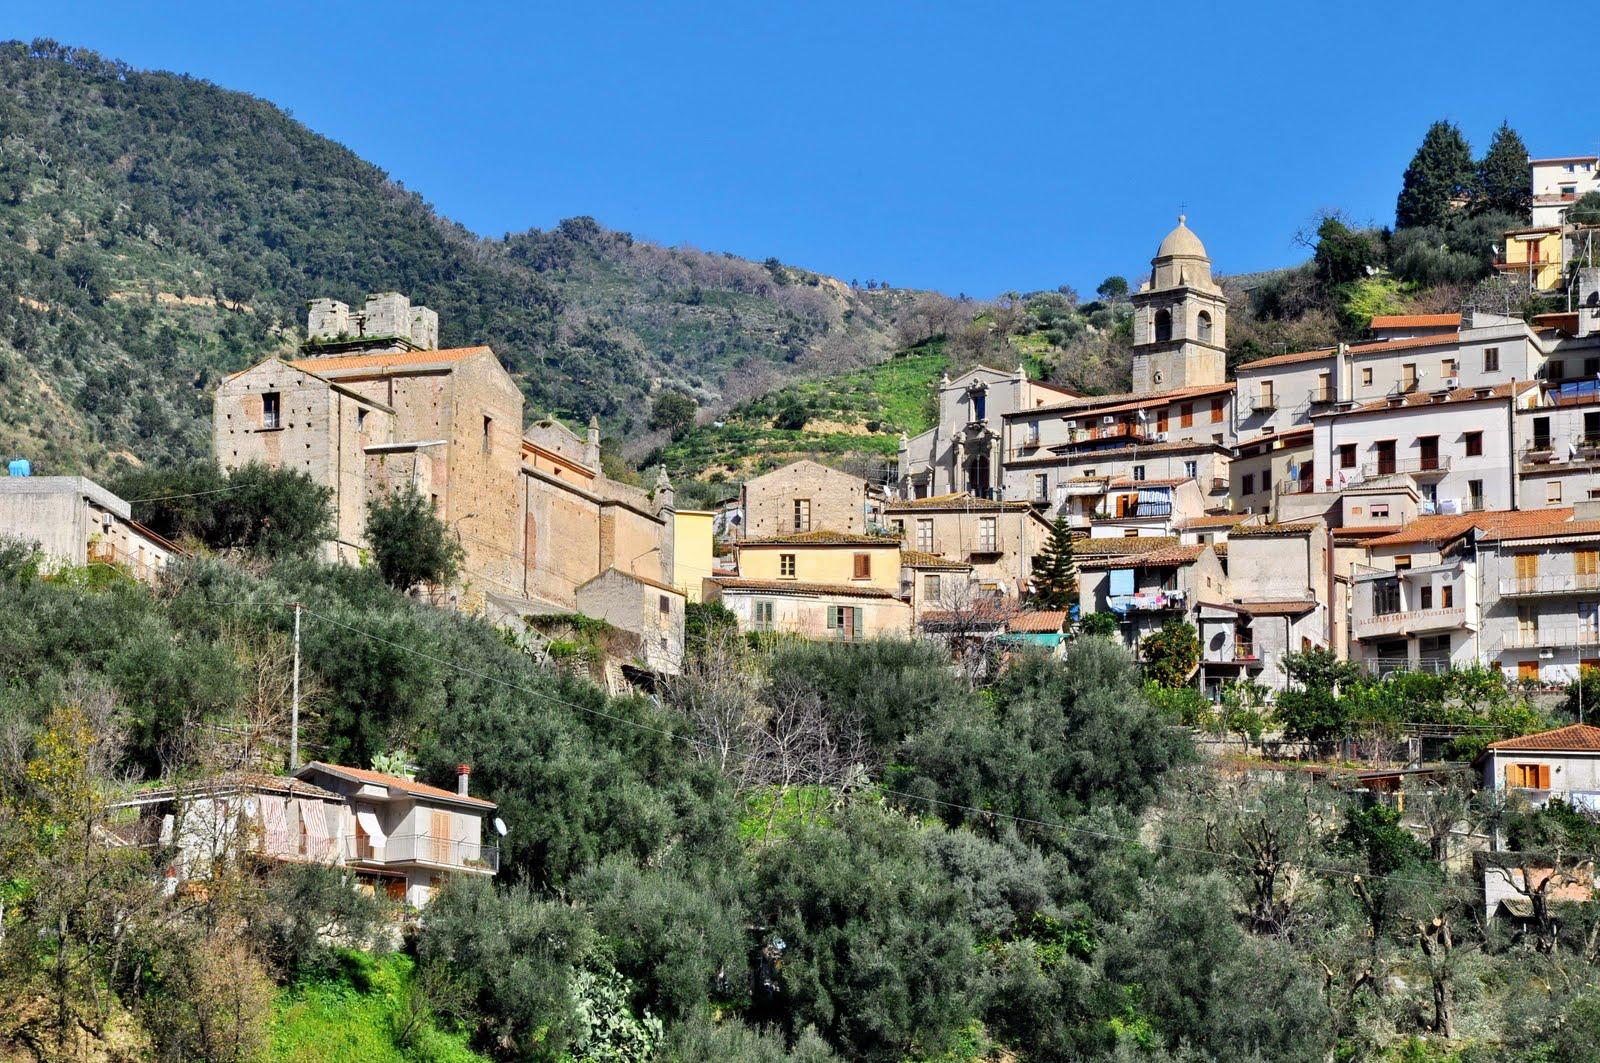 http://www.quadrifoglionews.it/public/img_notizie/N8442_Sant%27Angelo_di_Brolo3.jpg